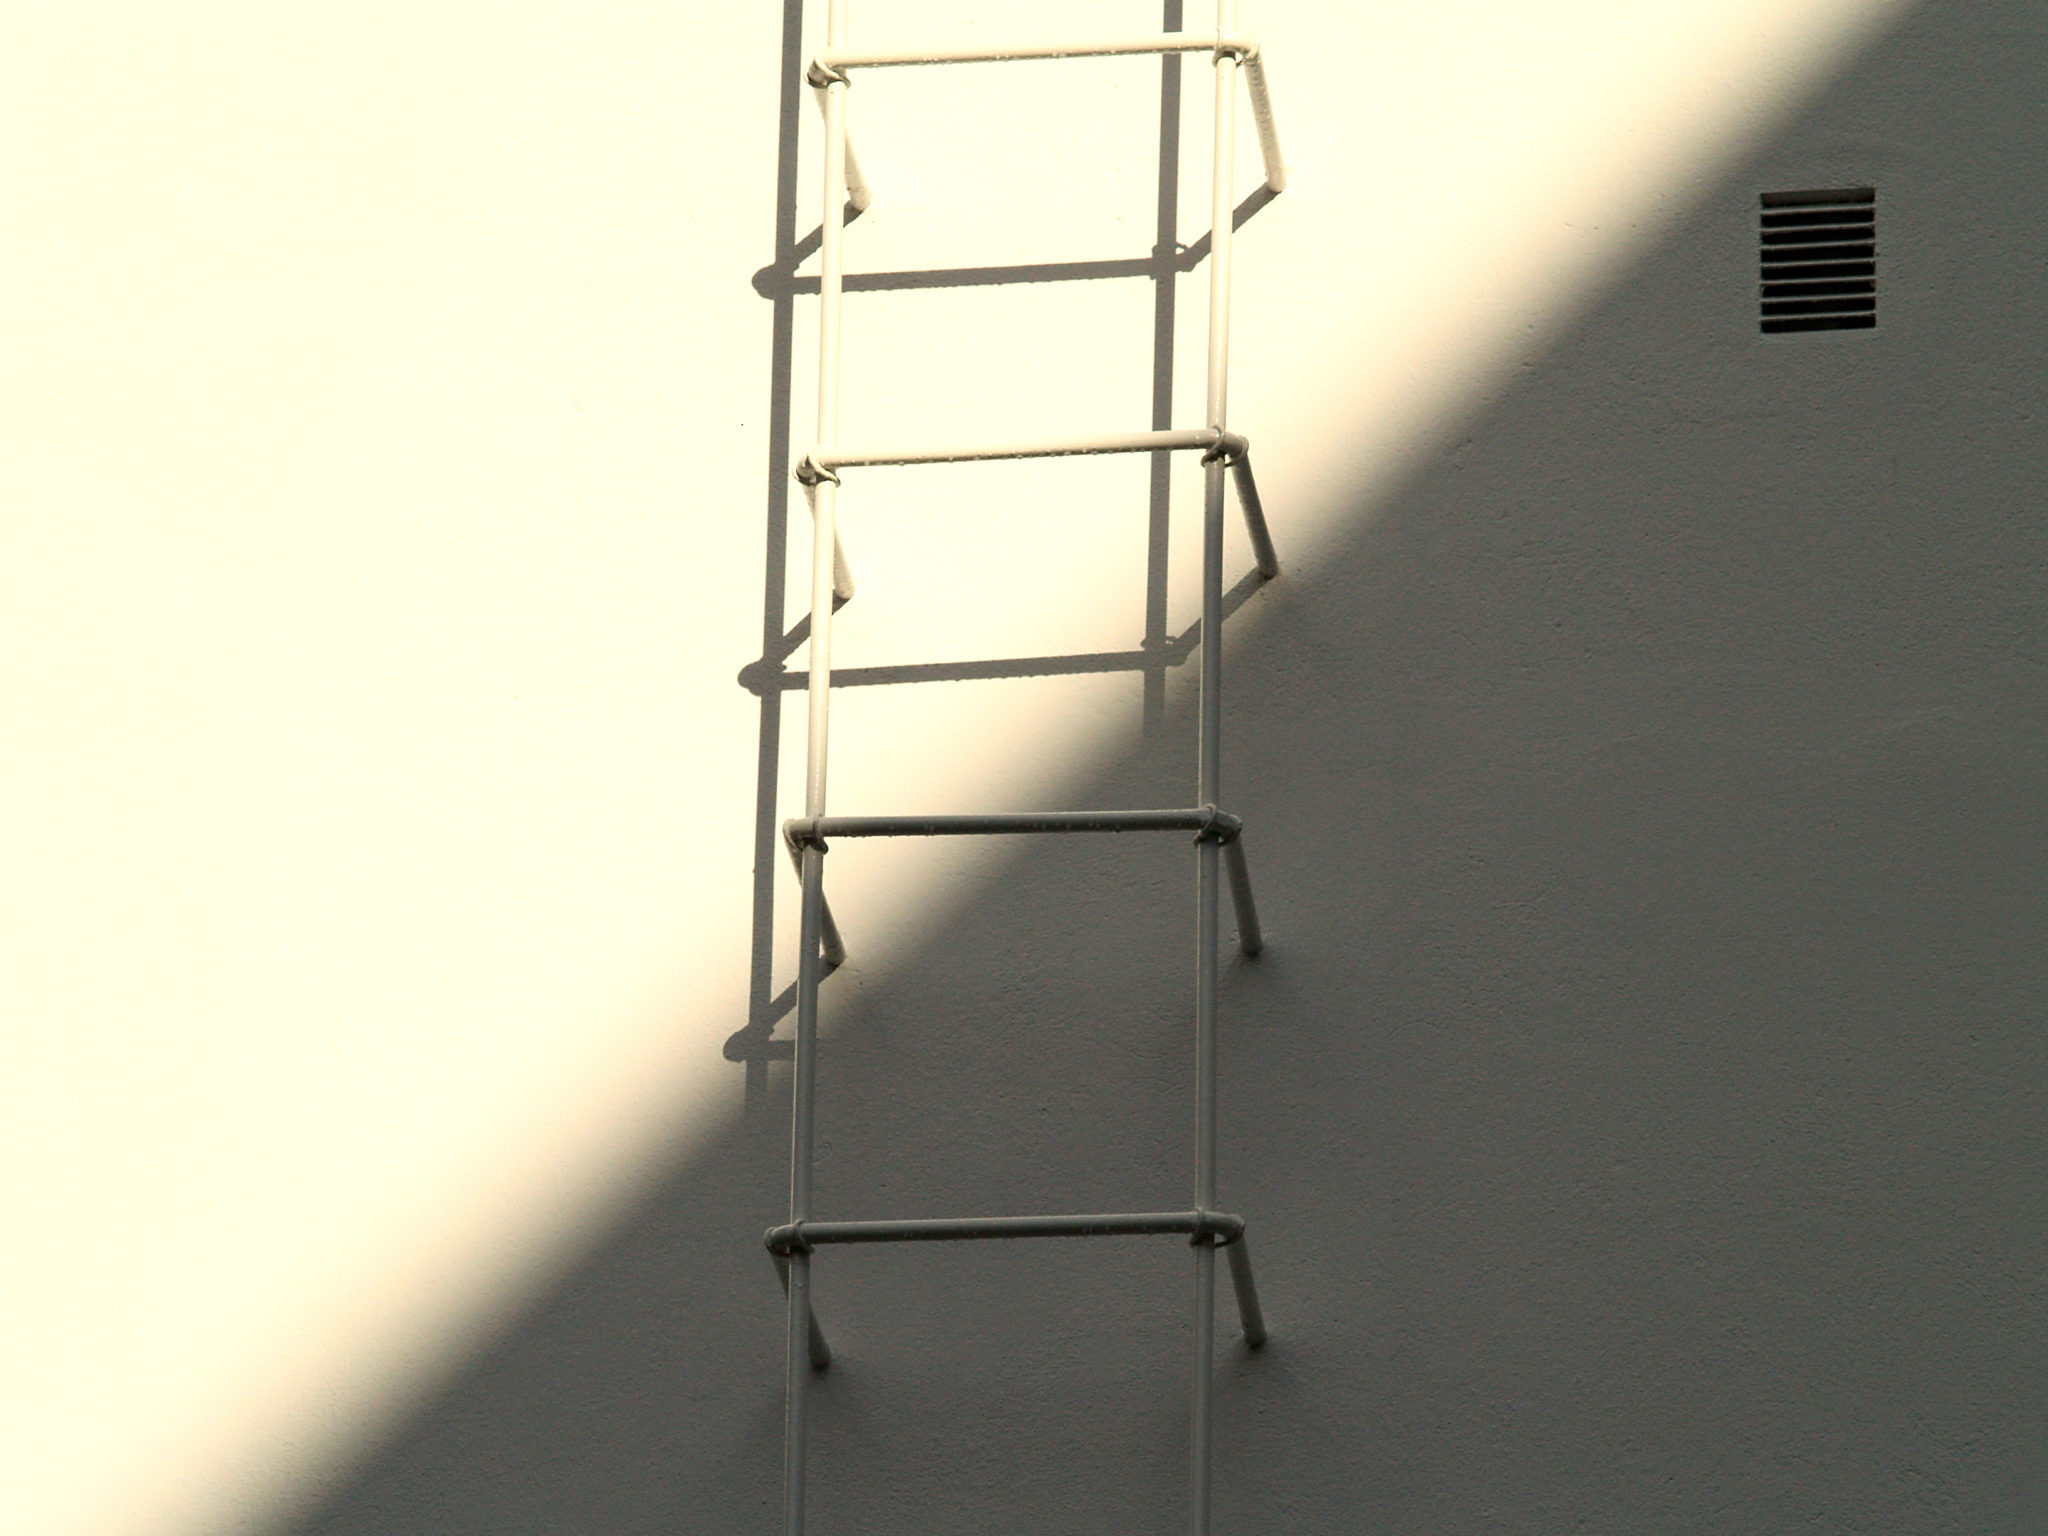 Ylös – Up / 2007